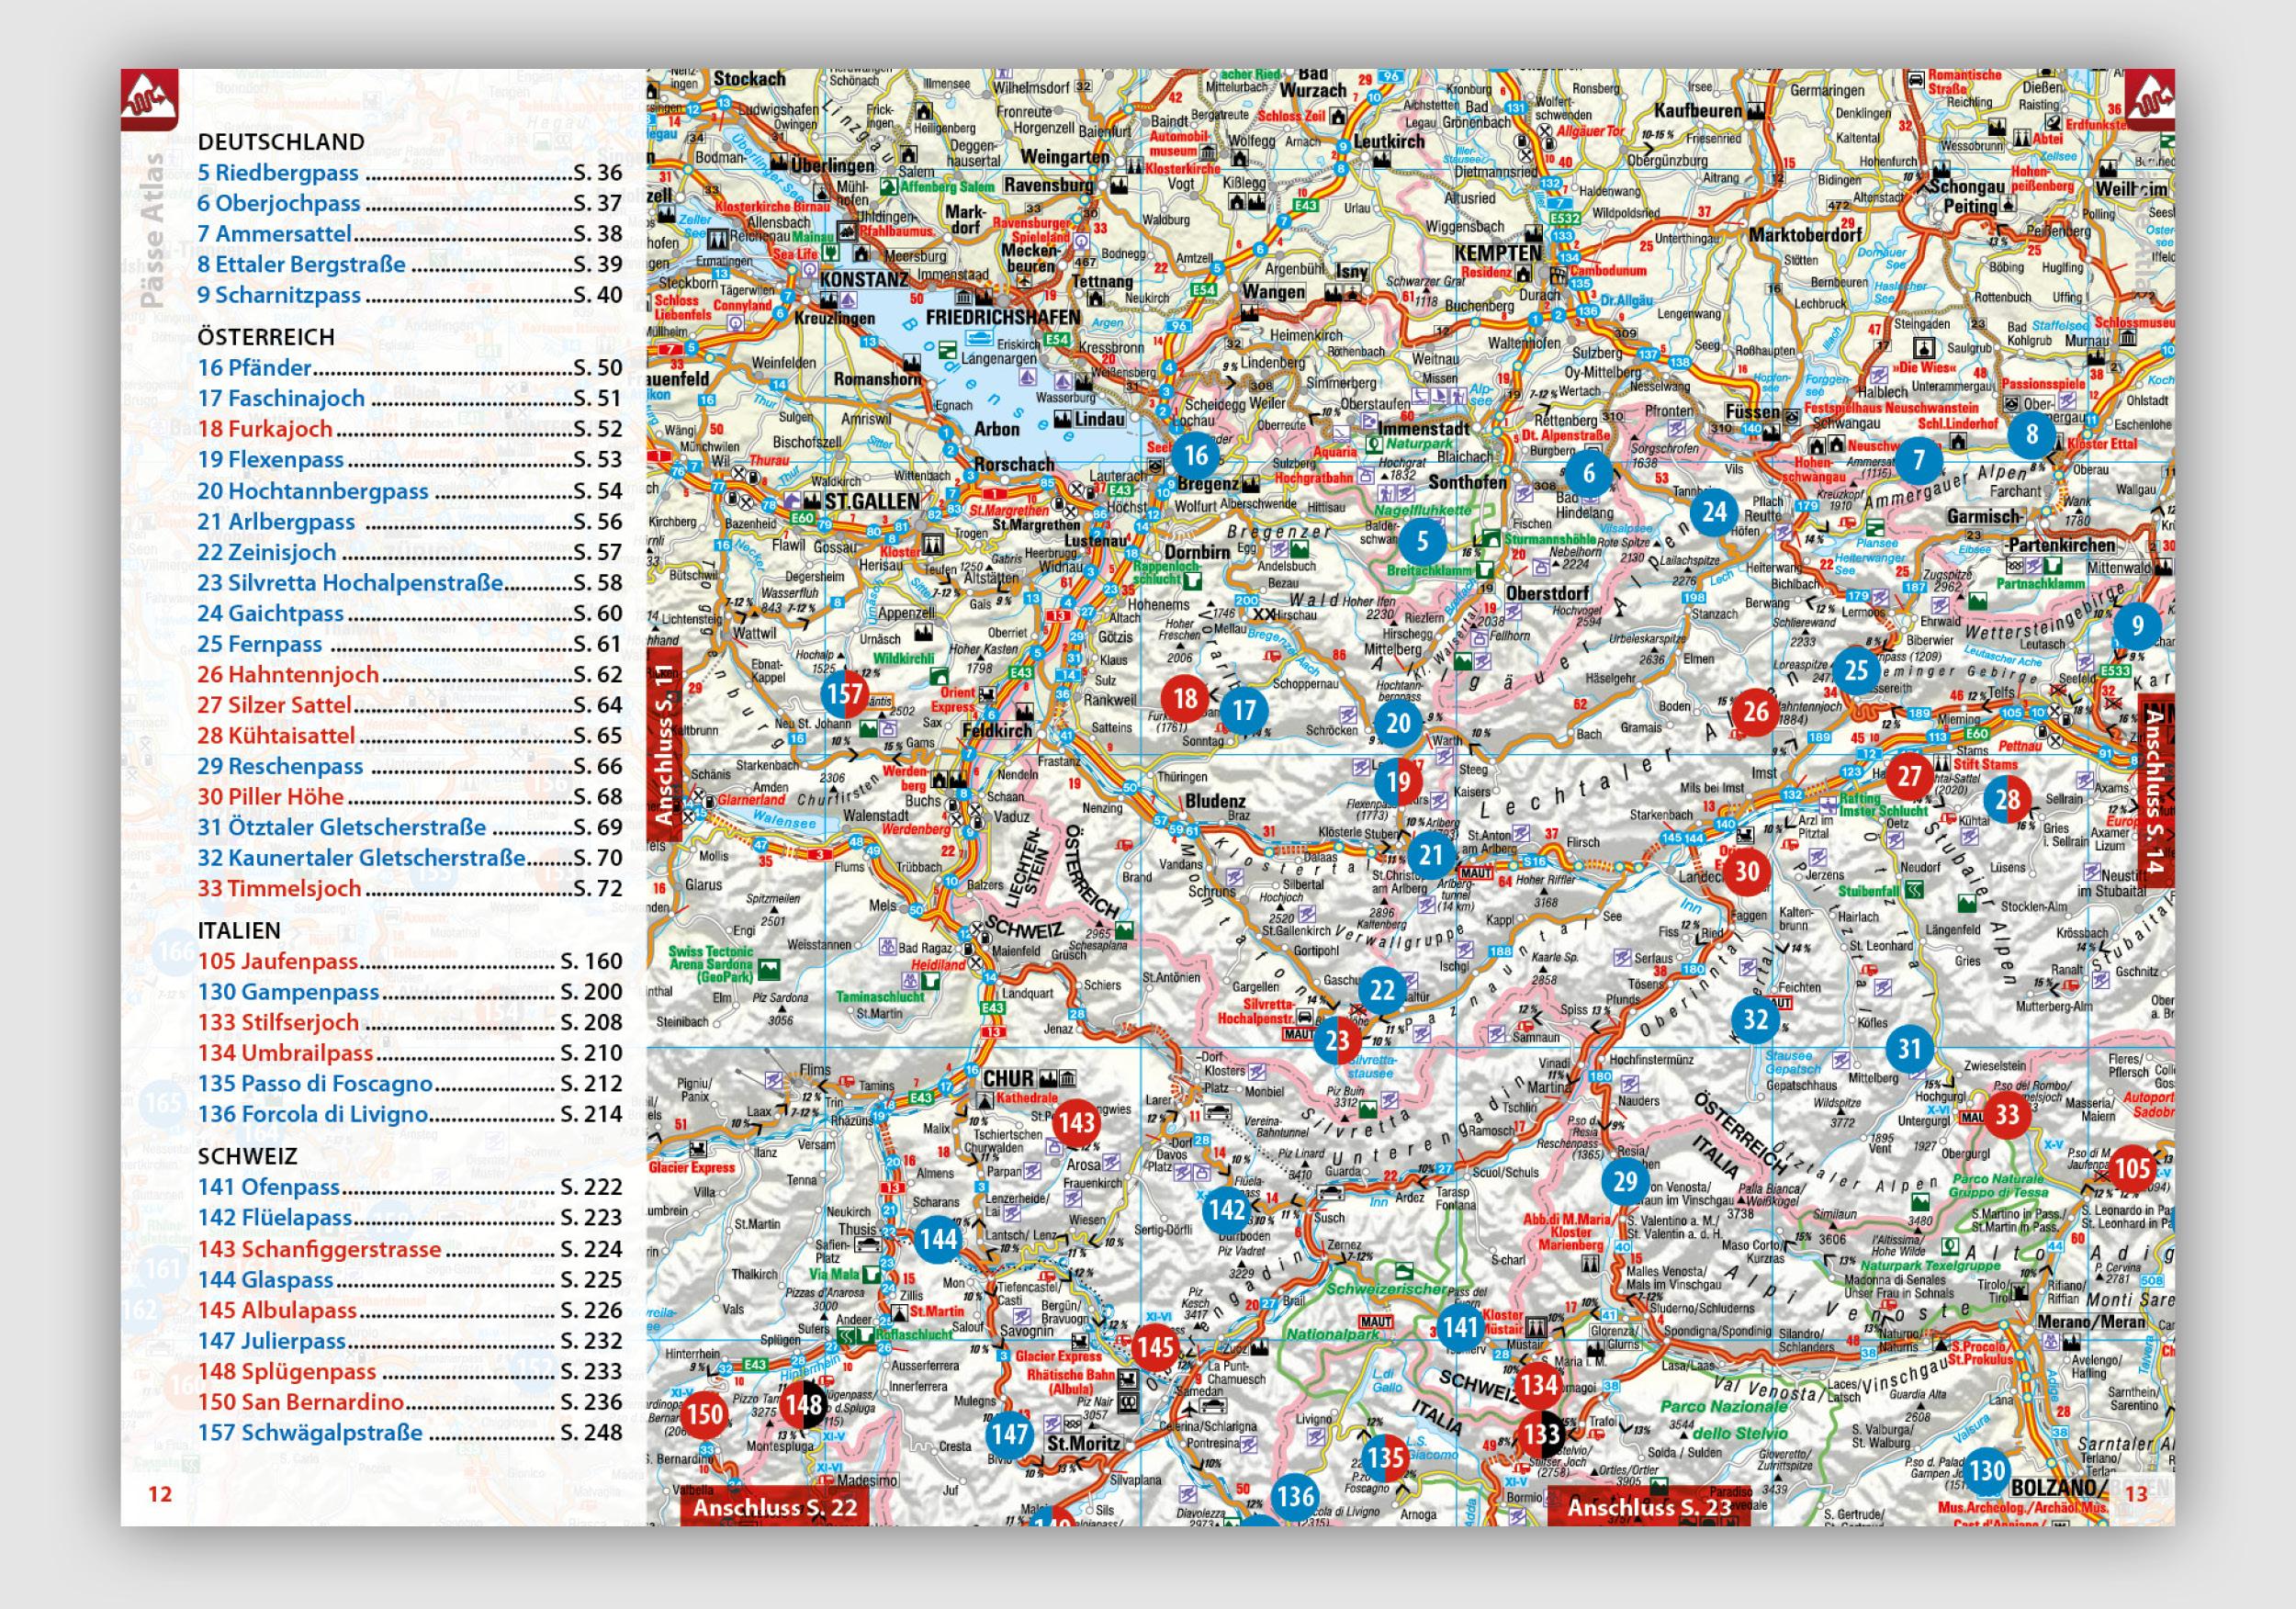 Alpenpässe Karte.Neu Pässe Atlas 2019 222 Pässe Und Panoramastraßen